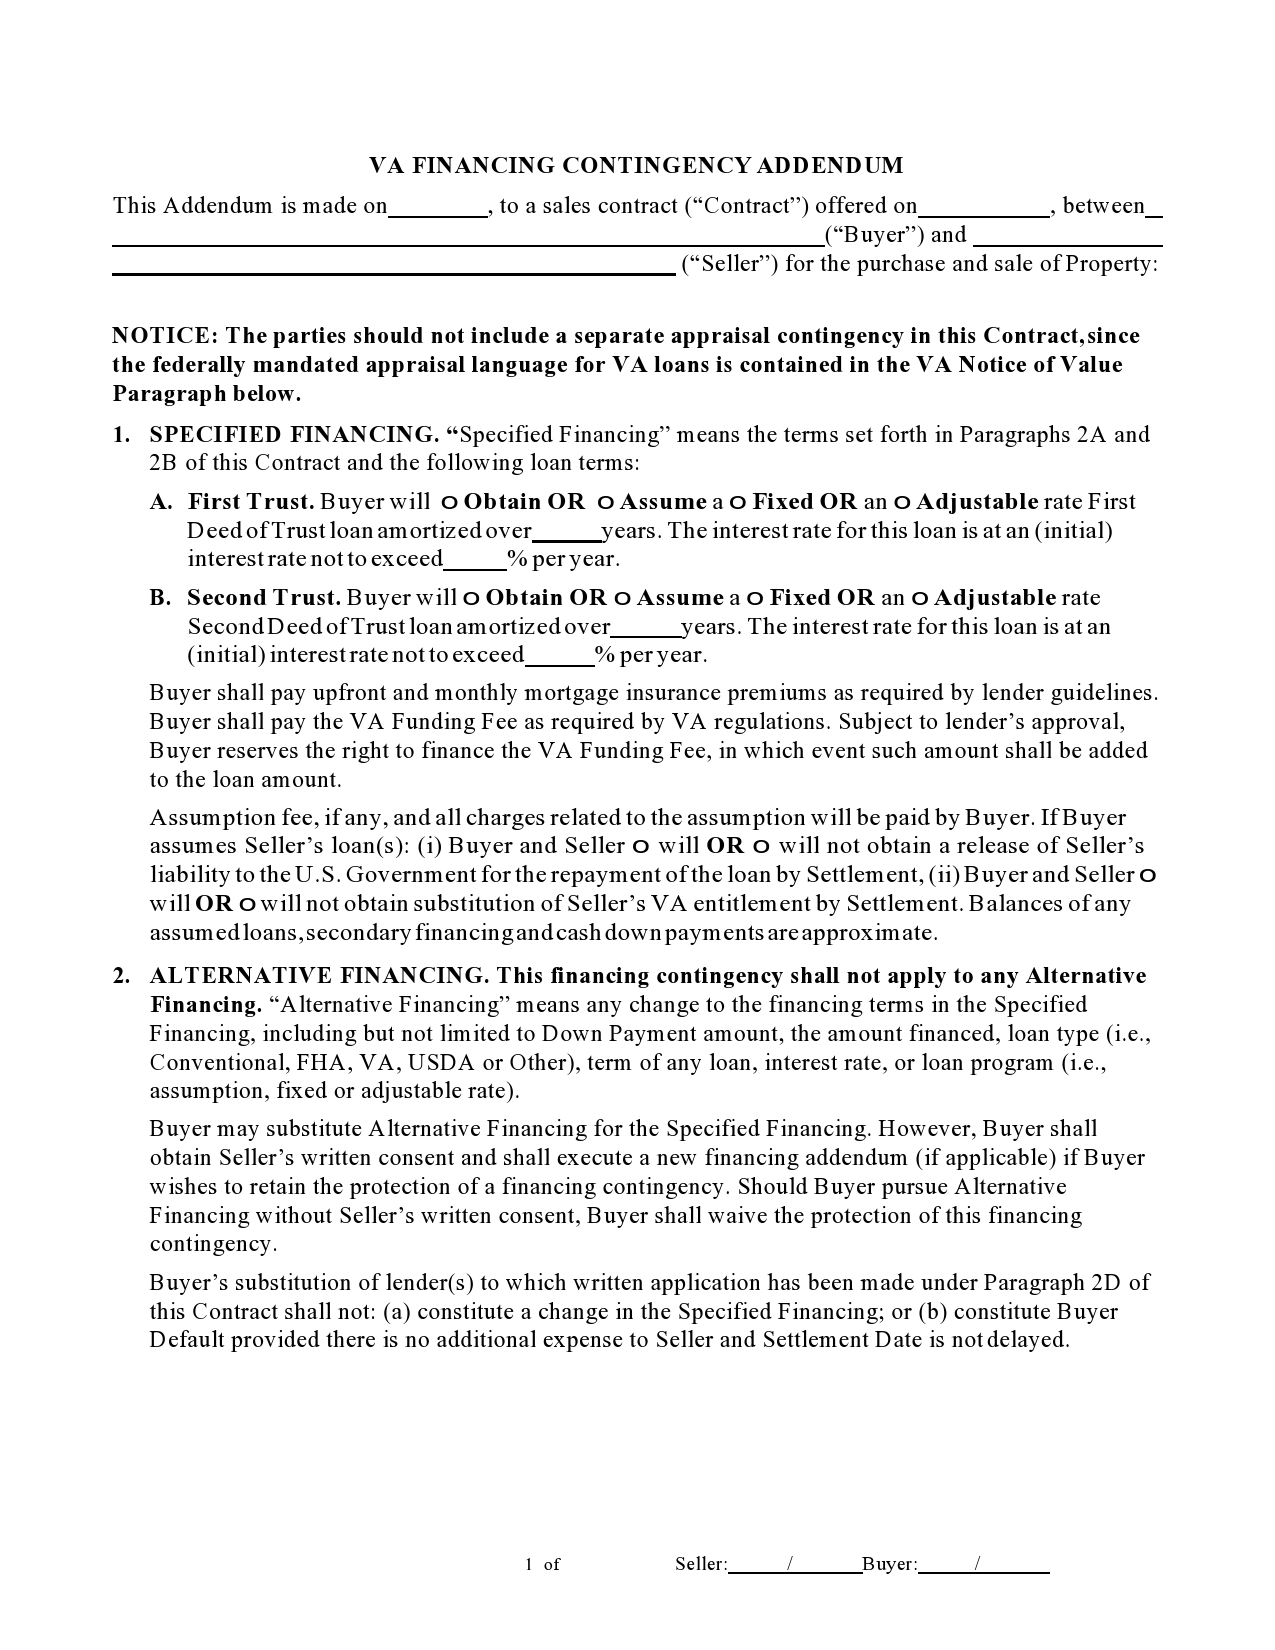 Free seller financing addendum 31